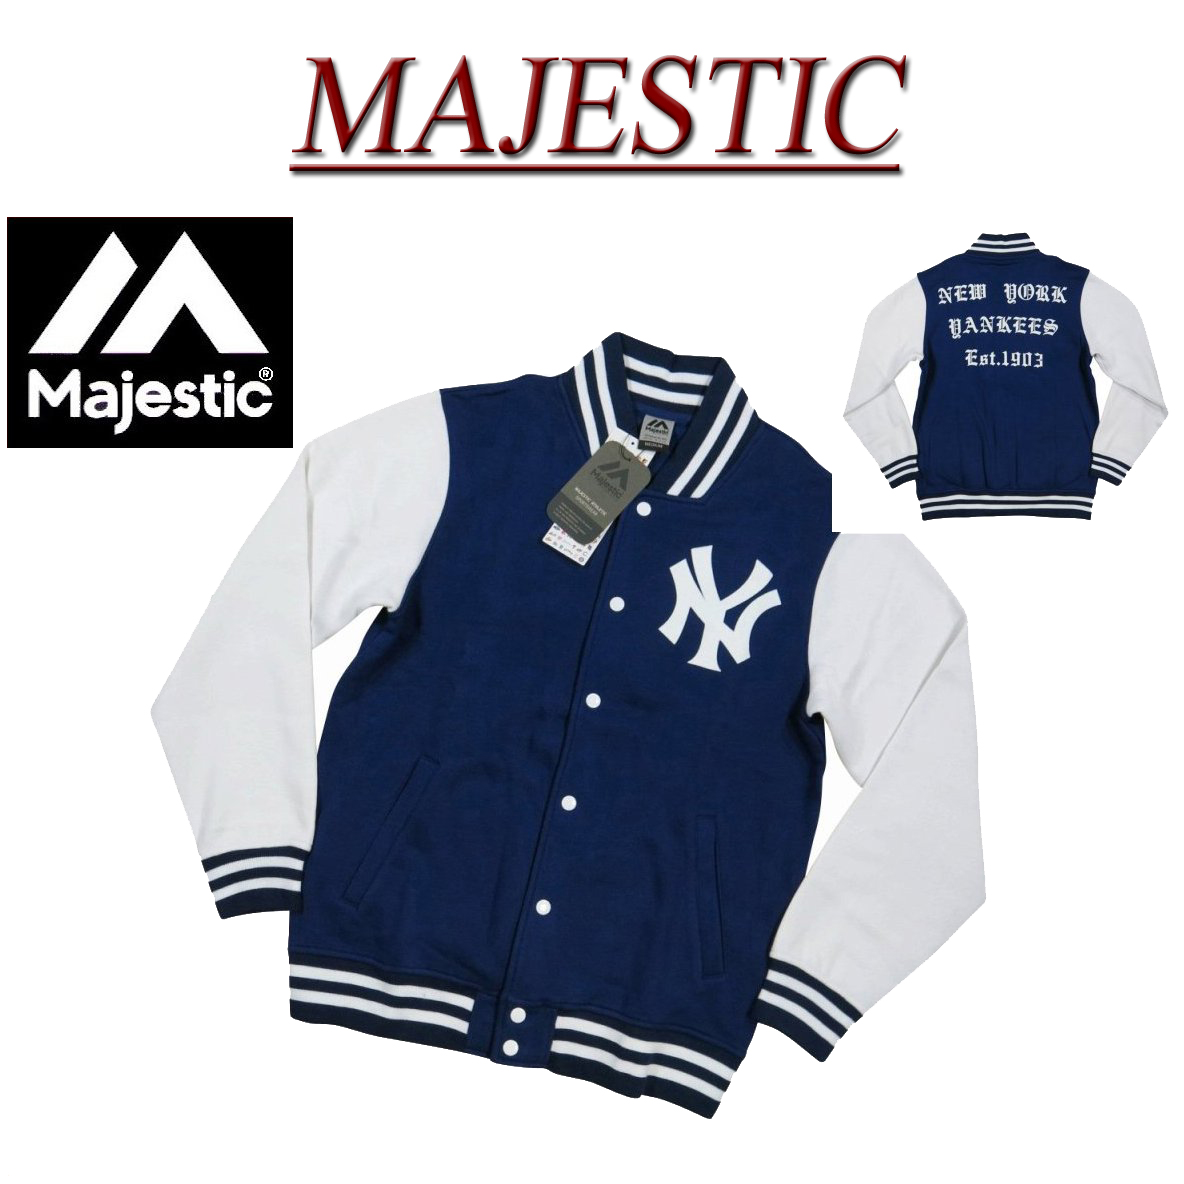 2a5692f1d J Rakuten Ichiba Plus Iz641 New Article Majestic New York · Reservation Mlb  Angels Shohei Otani Flextime Base Authentic Player Uniform Jersey ...